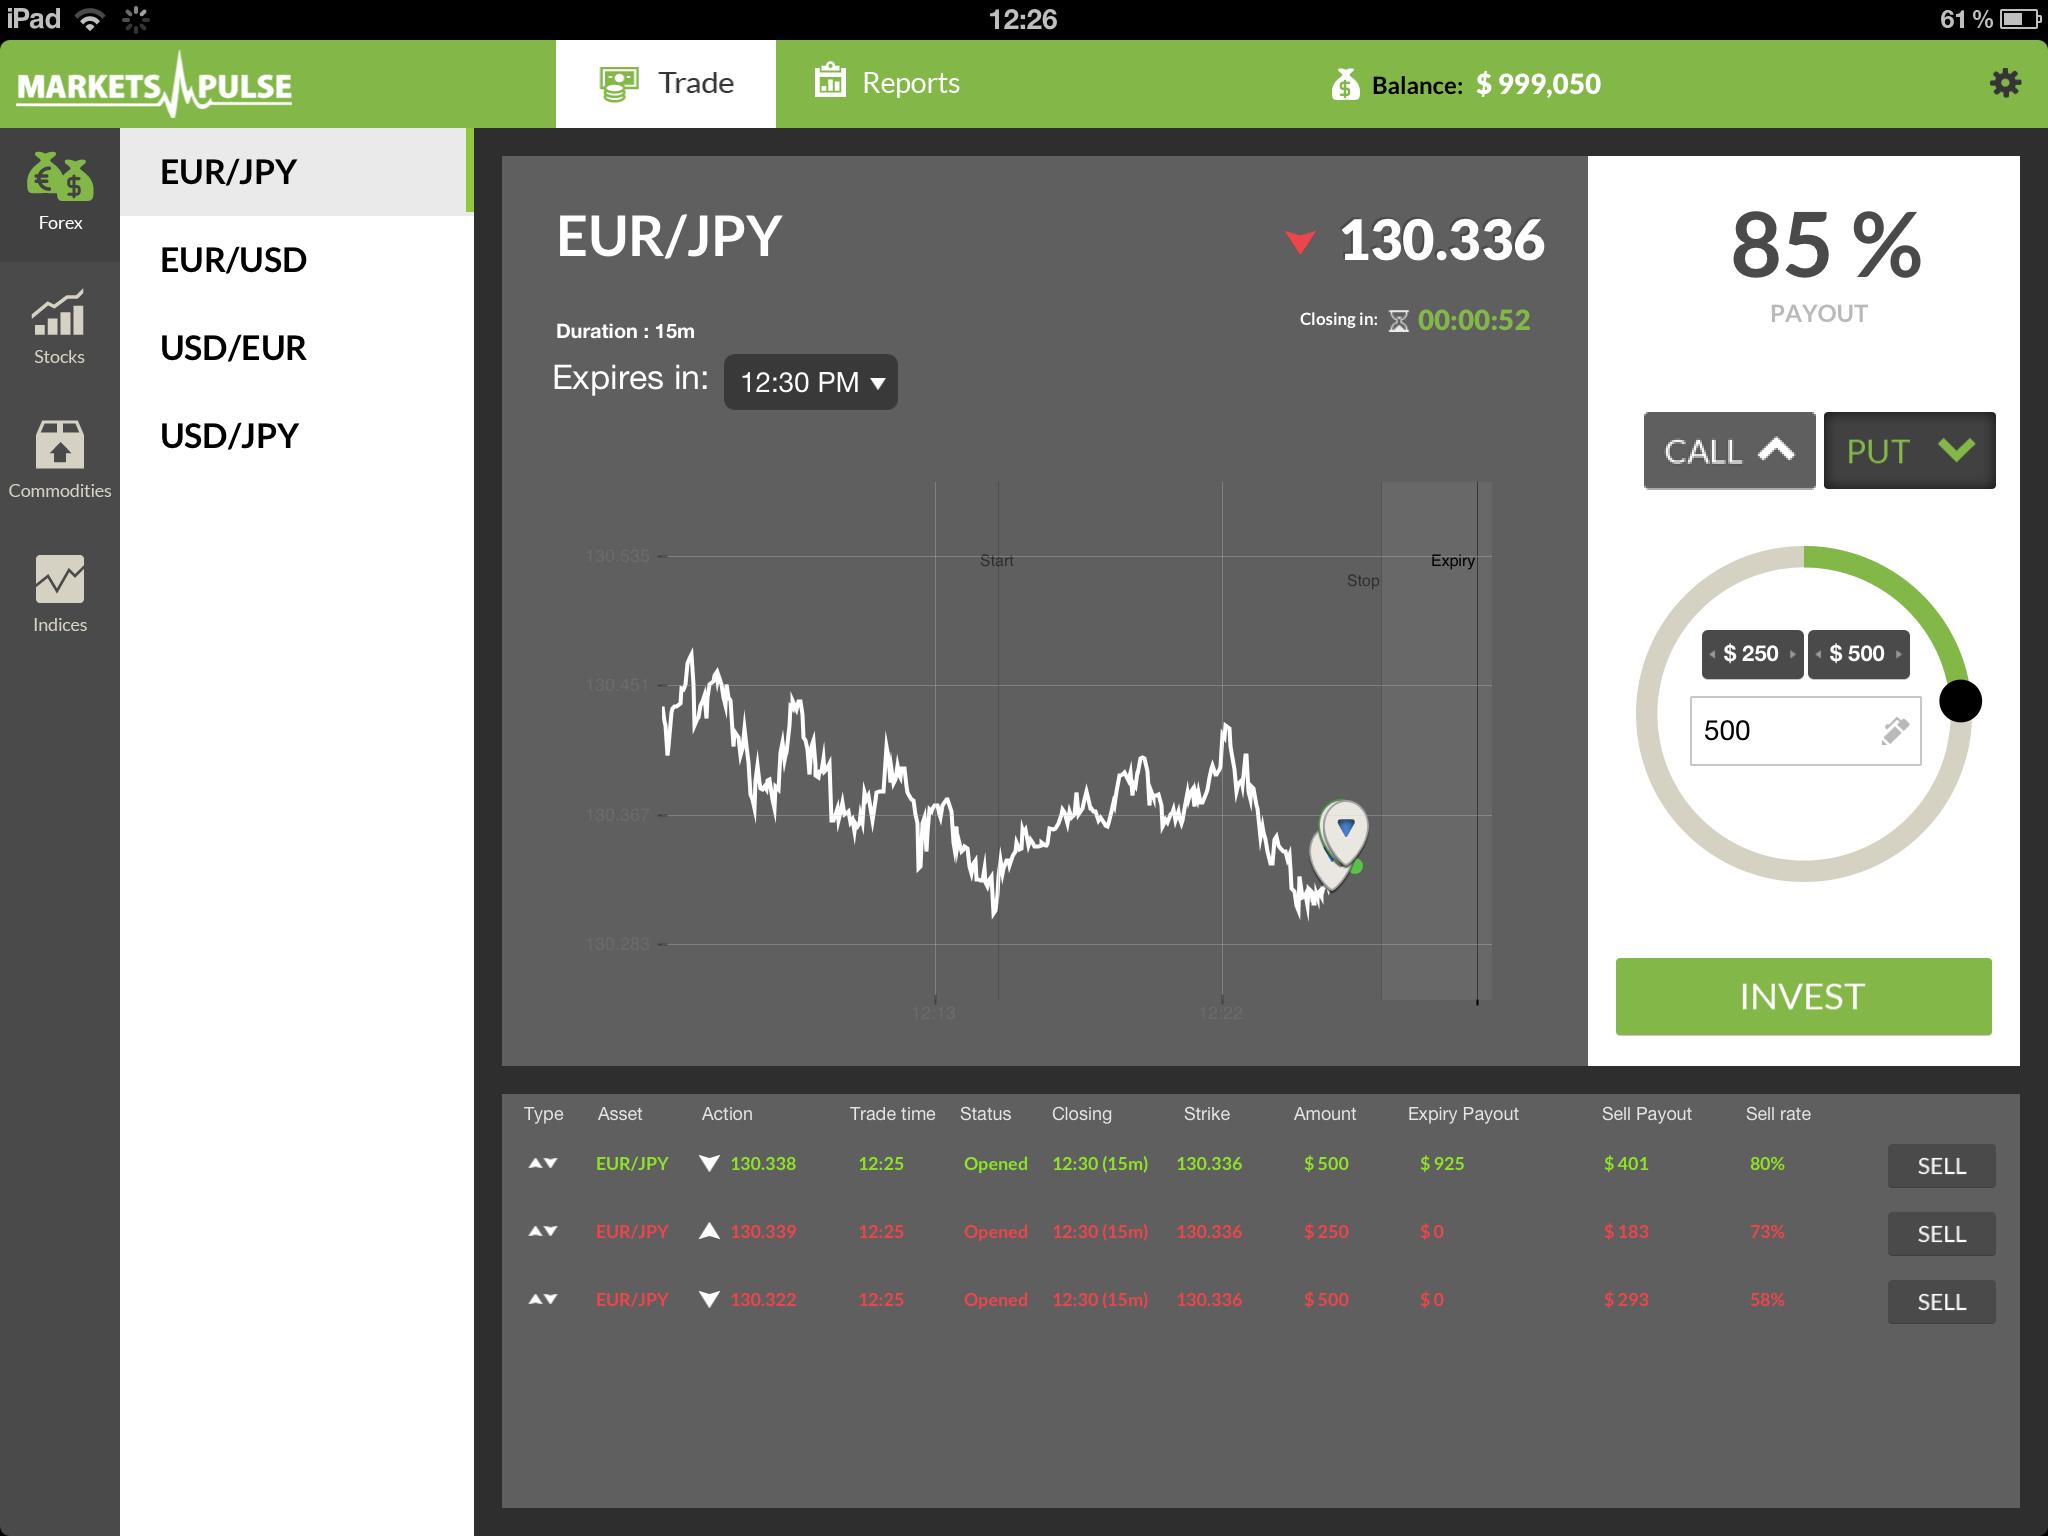 Ipad trade in options